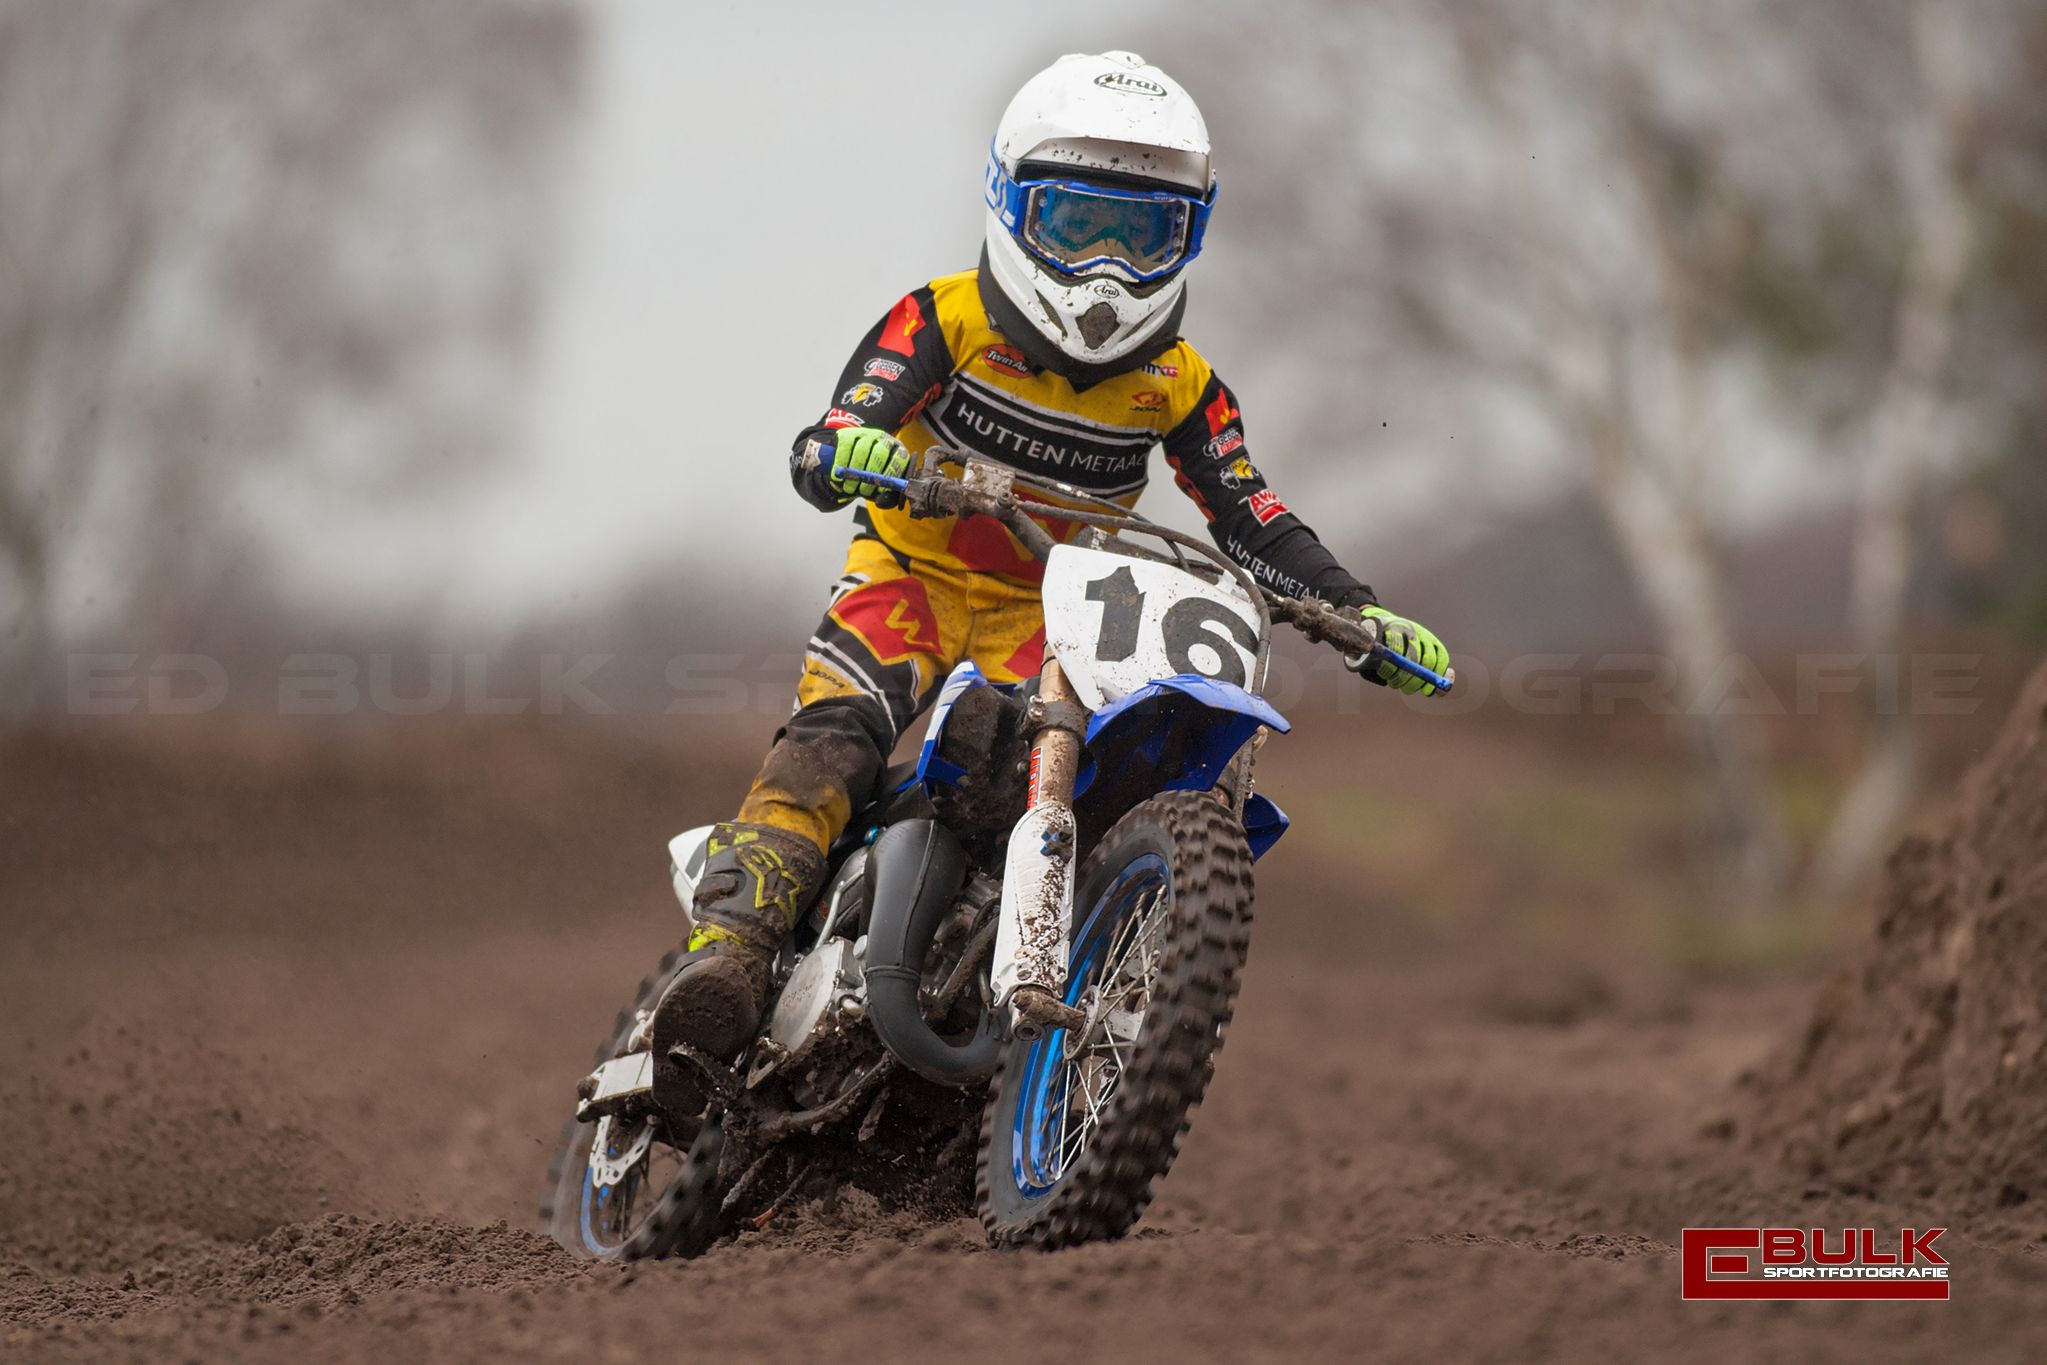 ebs_1241-ed_bulk_sportfotografie